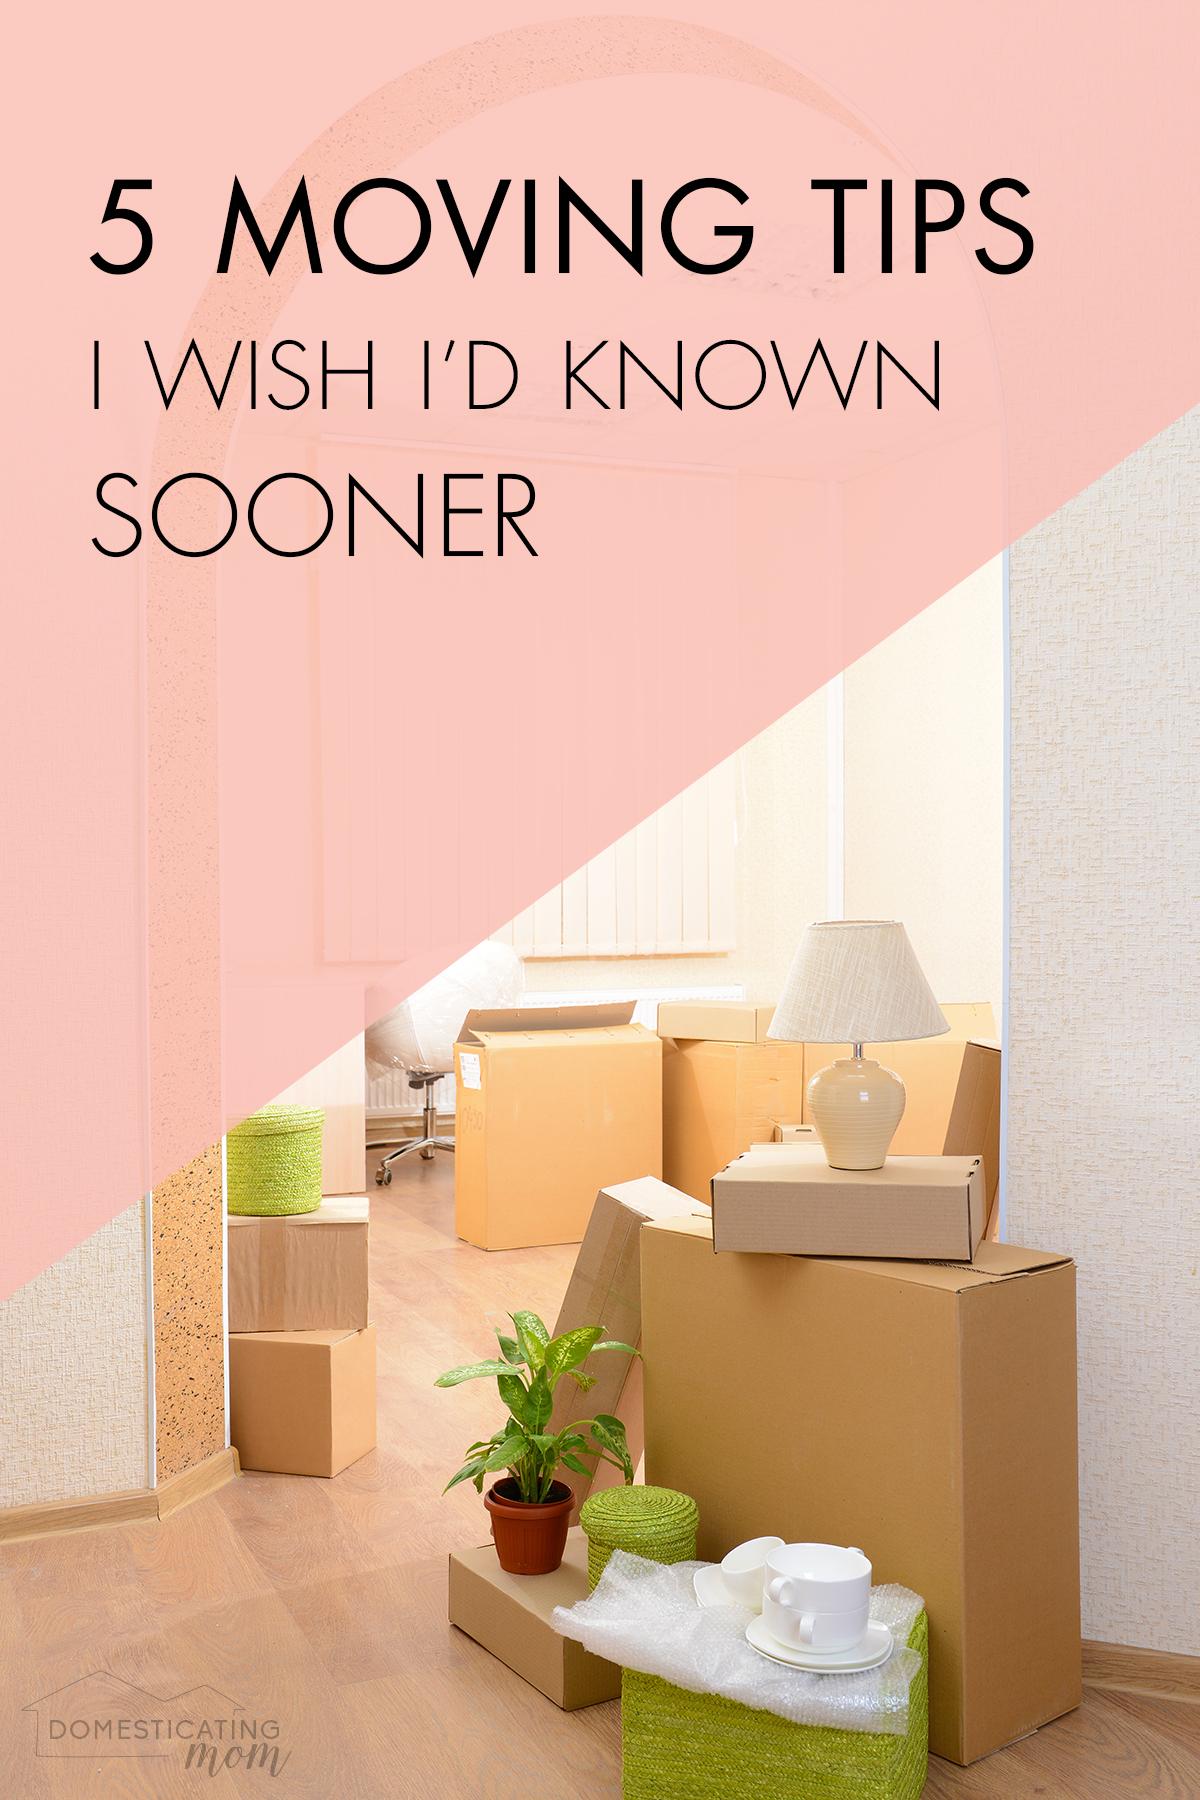 5 Moving Tips I Wish I Had Known Sooner